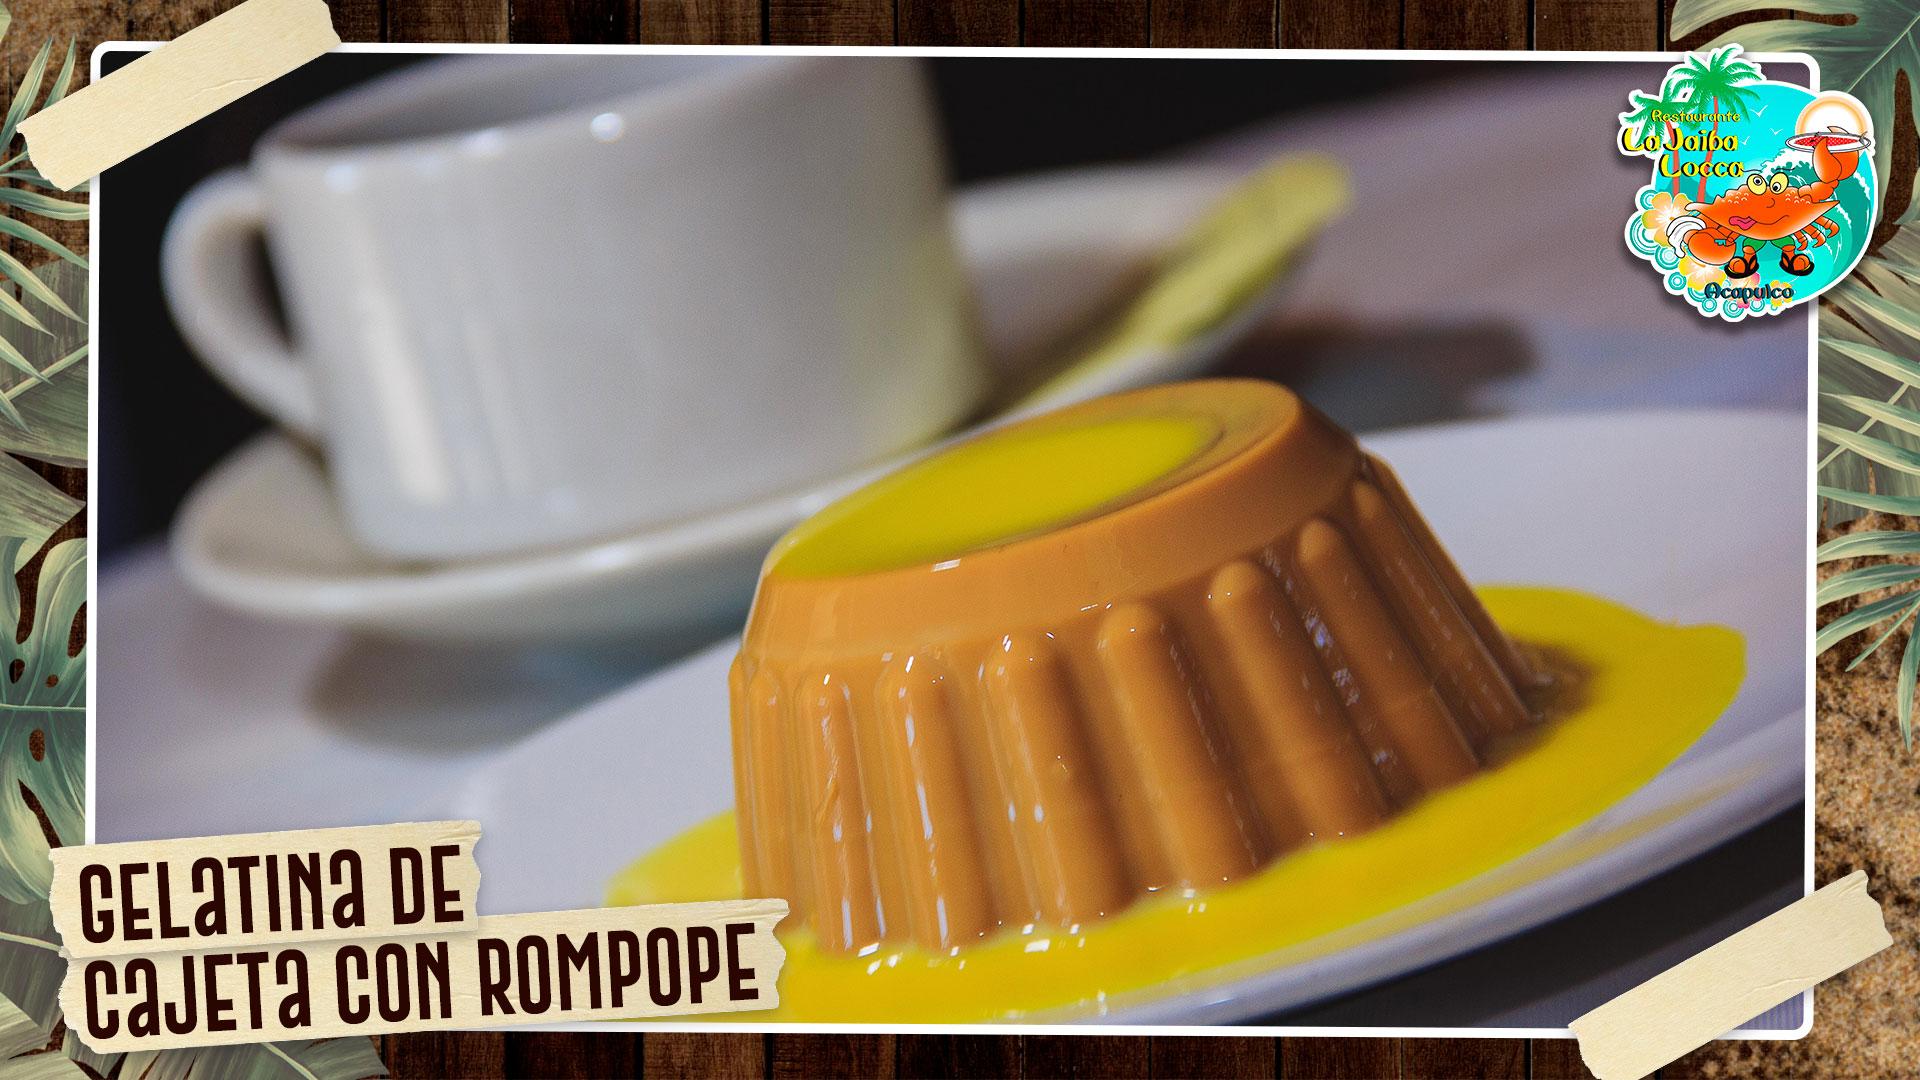 https://0201.nccdn.net/4_2/000/000/060/85f/54.-gelatina-de-cajeta-con-rompope.jpg